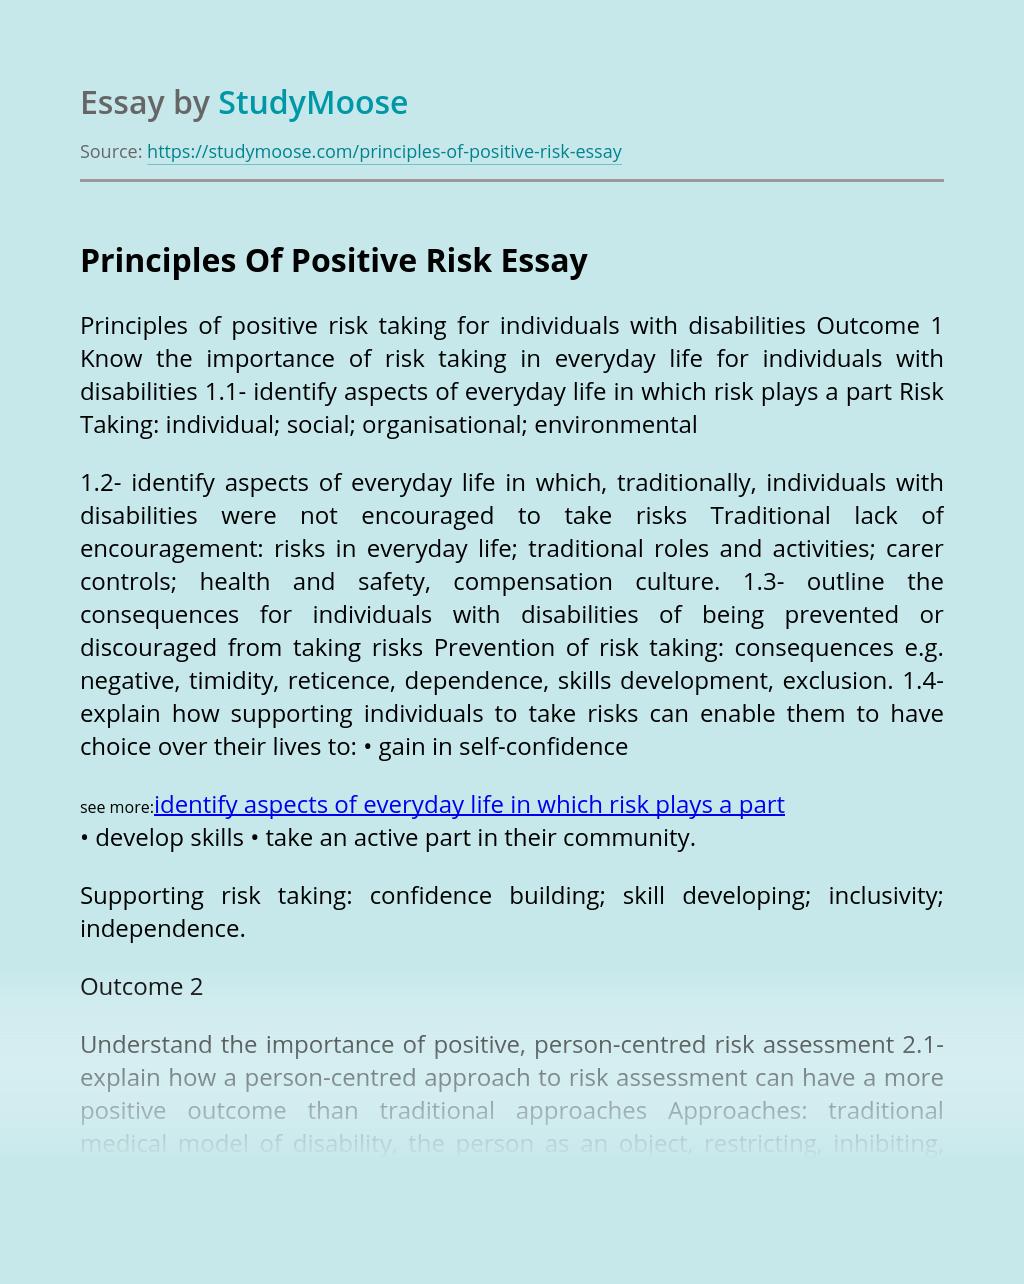 Principles Of Positive Risk